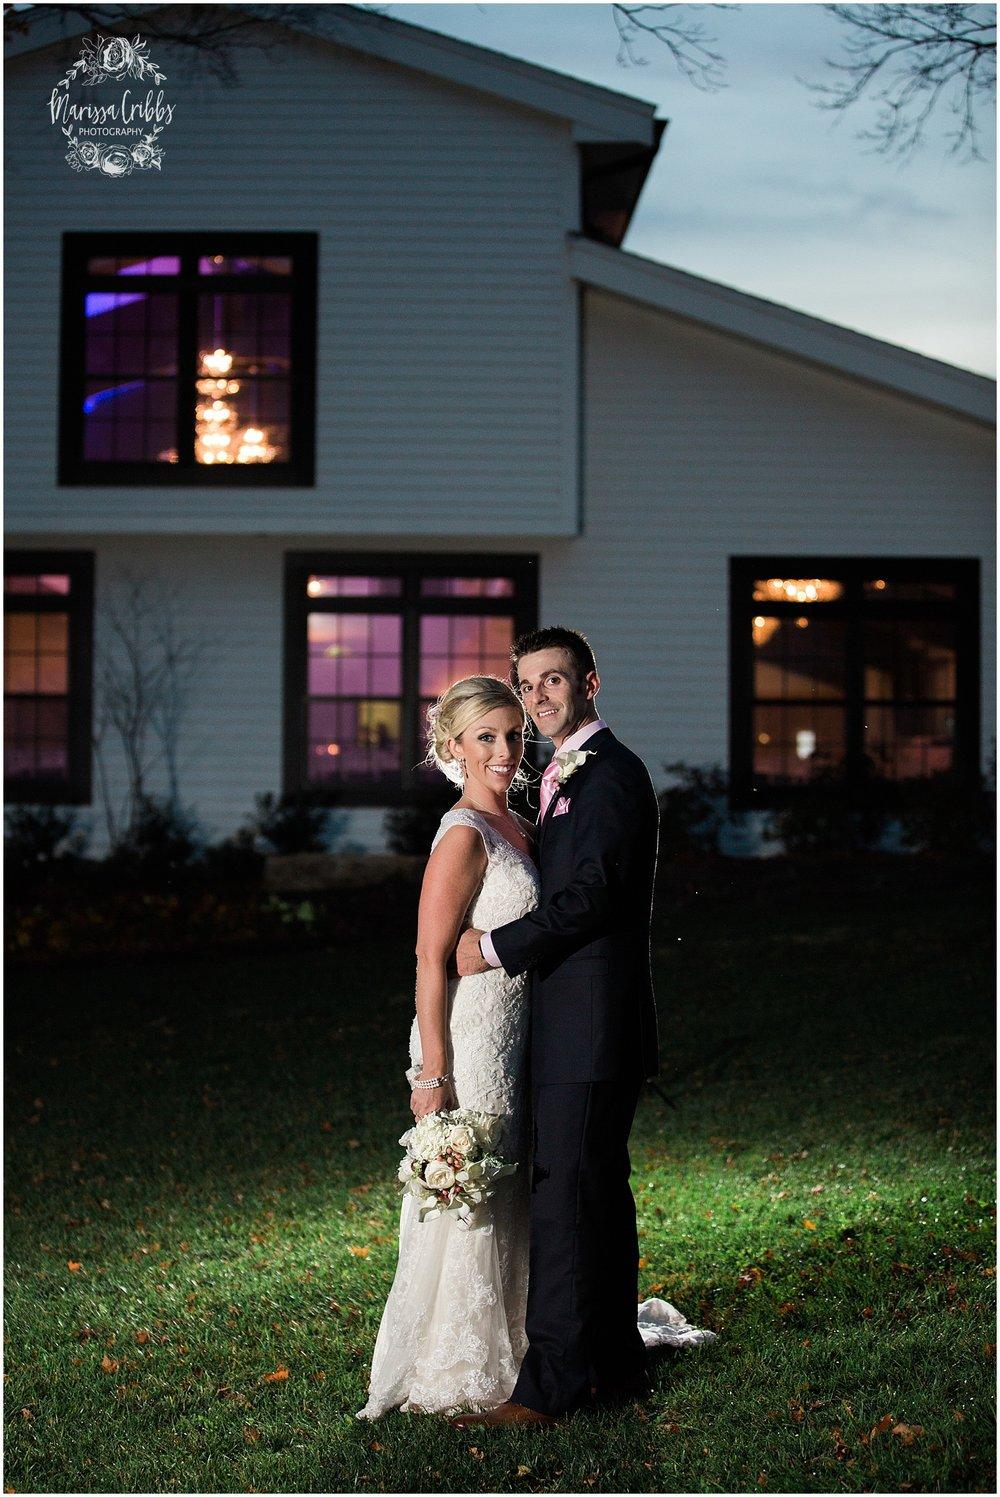 Alex & Amie | Eighteen Ninety Event Space | Marissa Cribbs Photography | Kansas City Perfect Wedding Guide_1363.jpg